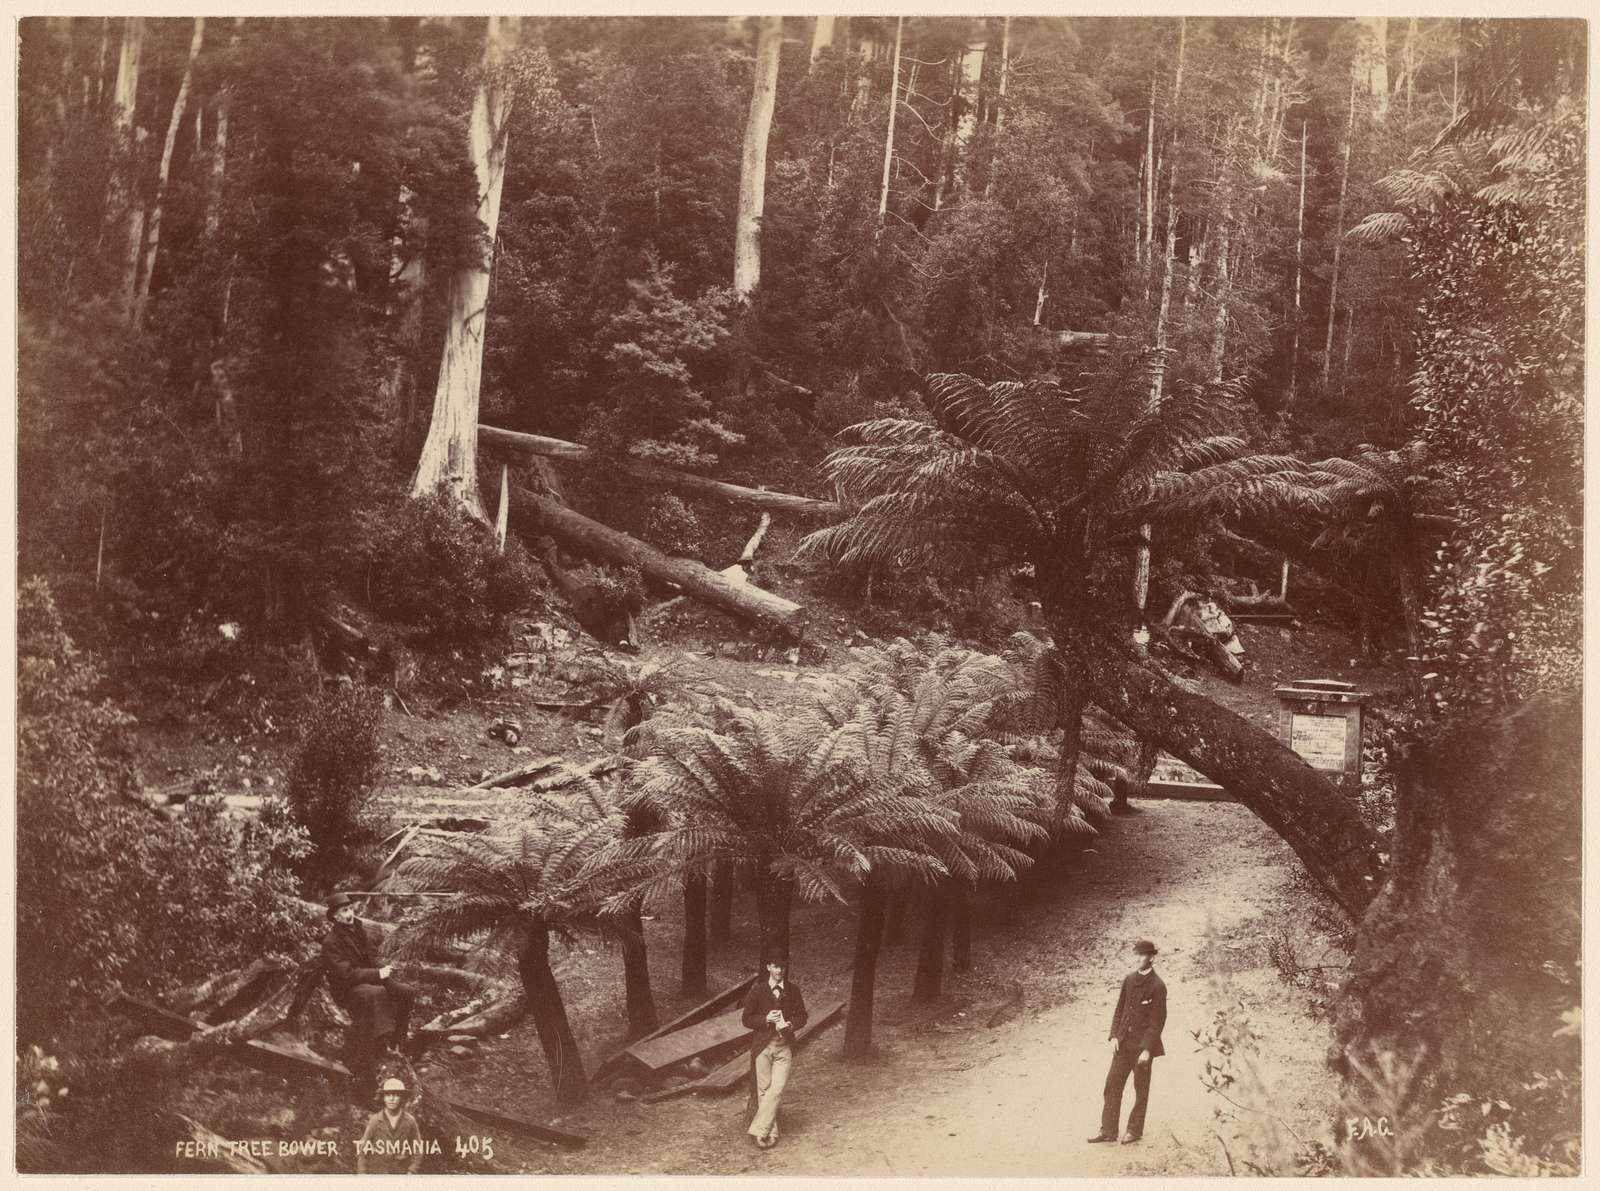 Fern Tree Bower, Tasmania